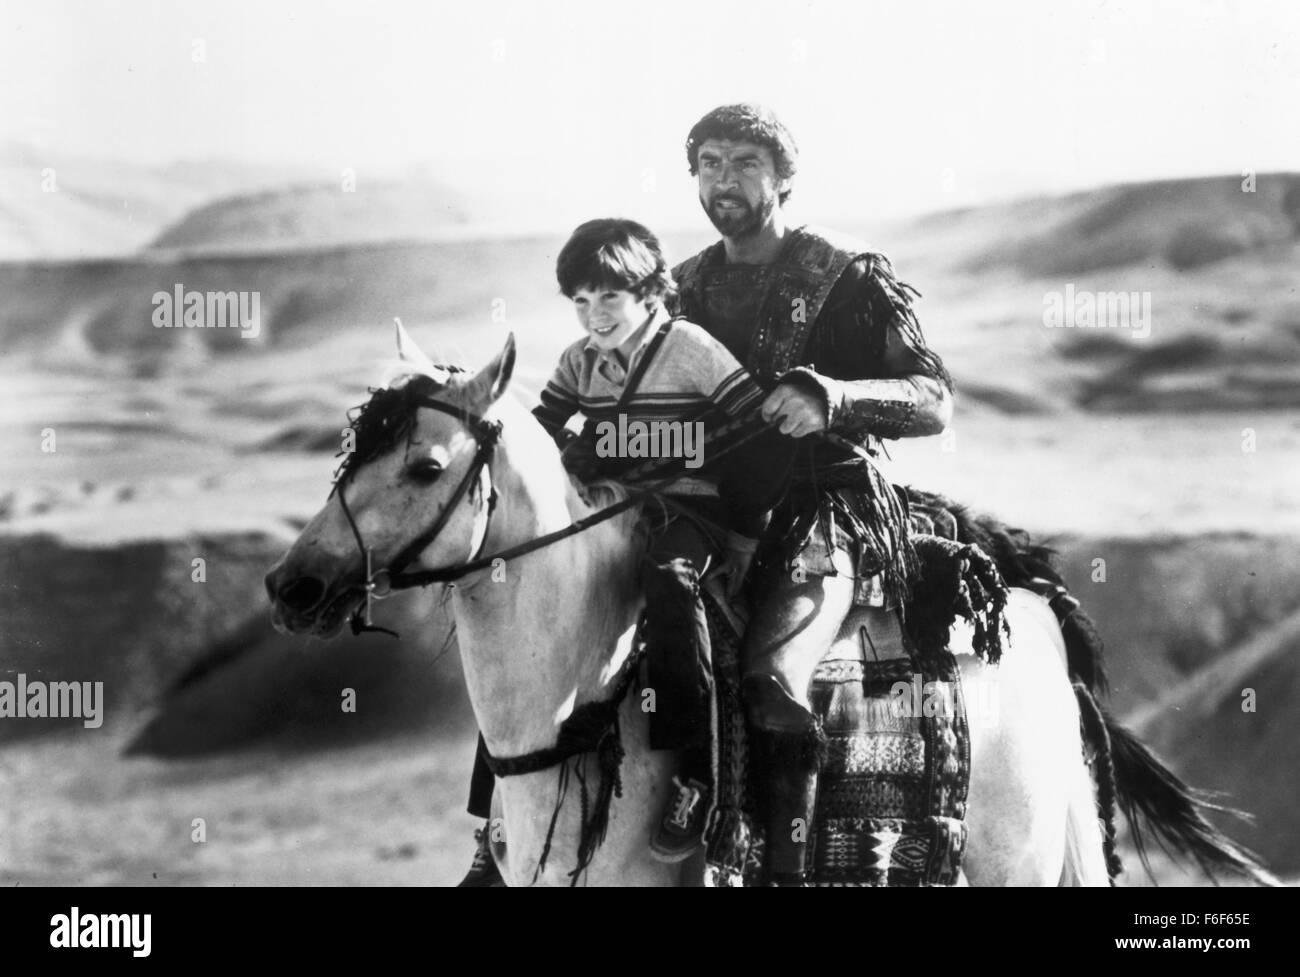 RELEASE DATE: November 6, 1981  MOVIE TITLE: Time Bandits  STUDIO: HandMade Films  DIRECTOR: Terry Gilliam  PLOT: - Stock Image